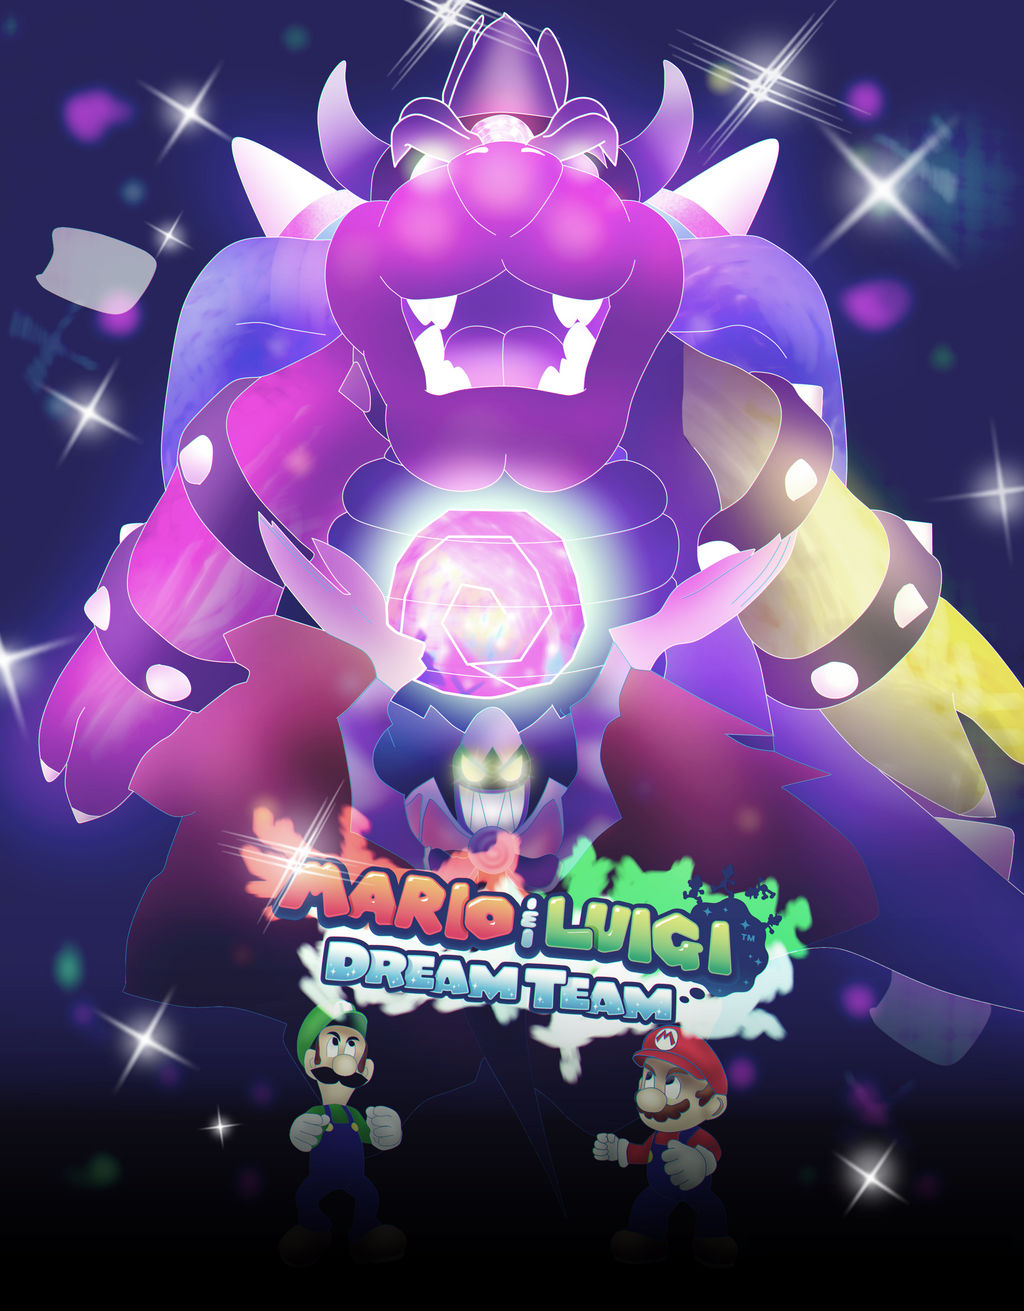 Mario And Luigi Dream Team Wallpaper By Carlosparty19 On Deviantart